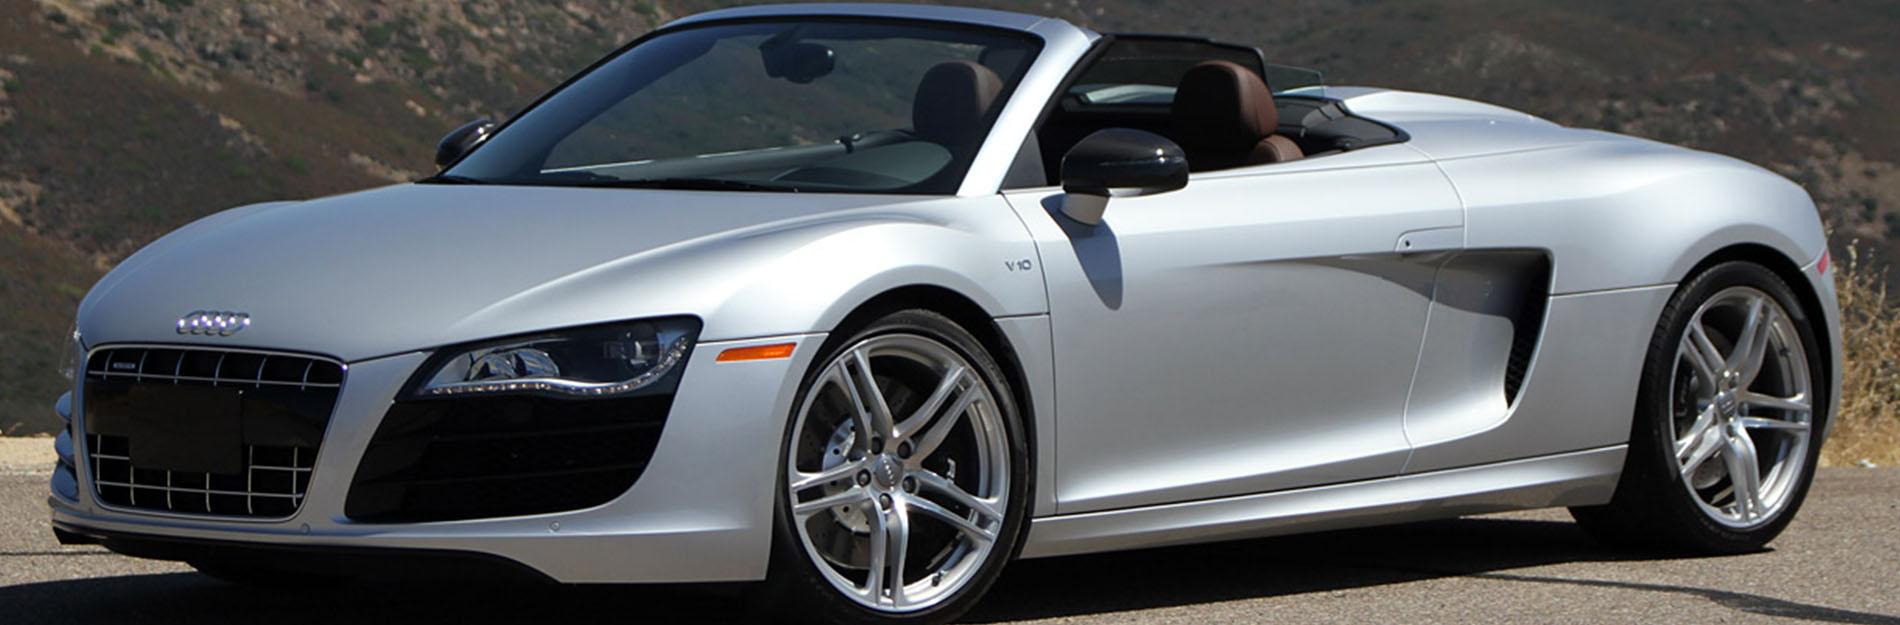 Audi audi r8 spyder v10 : Audi R8 V10 Spyder - TopGearCars®